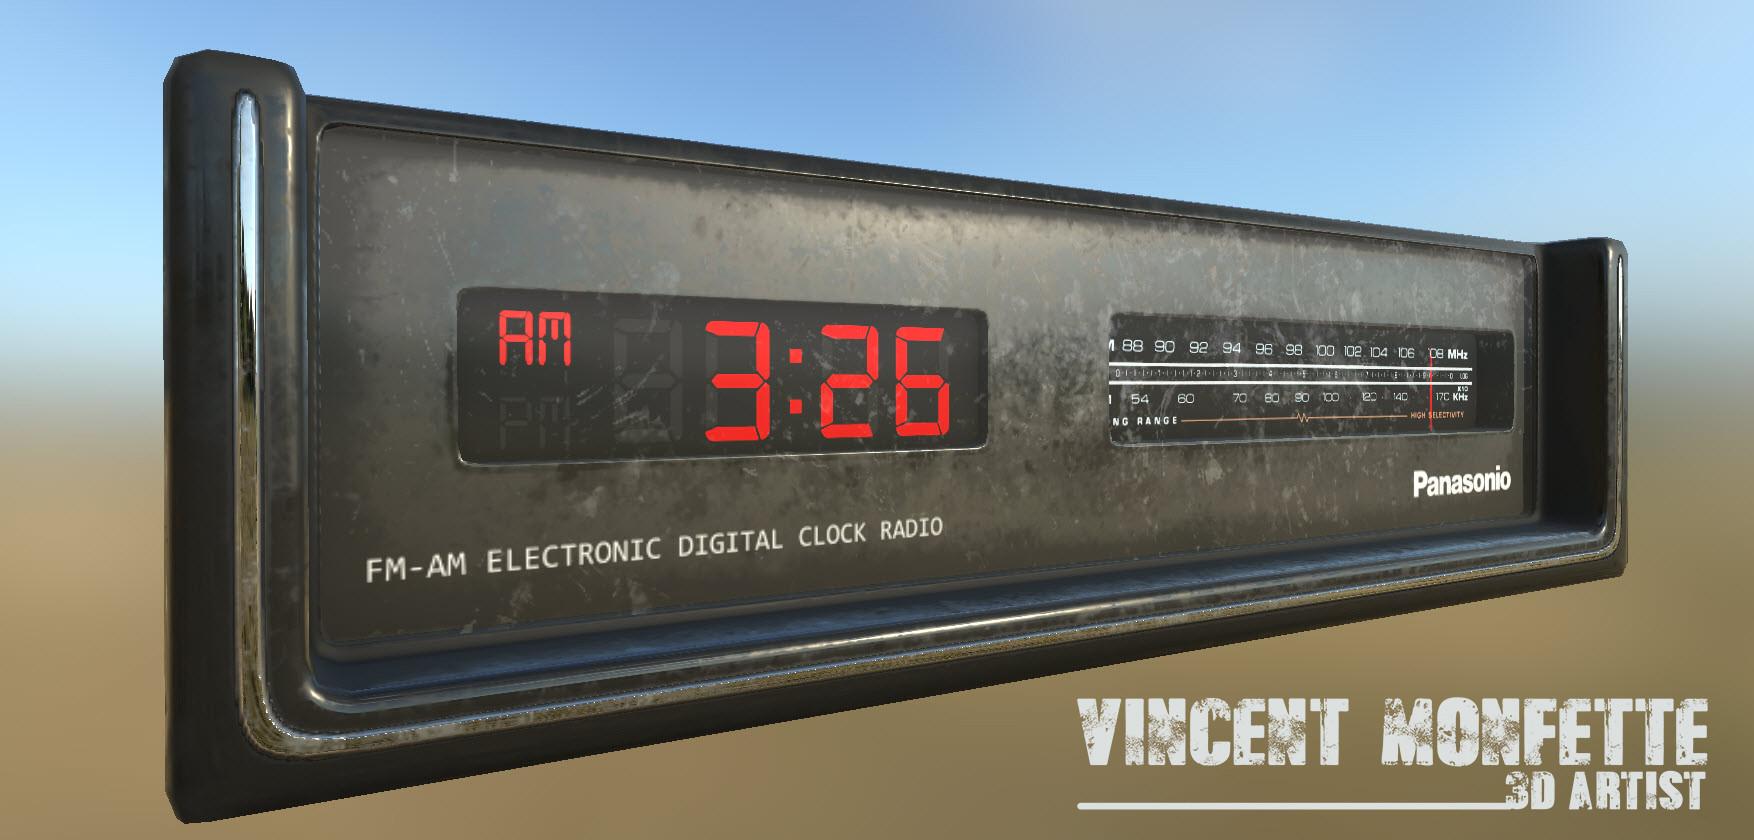 Vincent monfette radioname